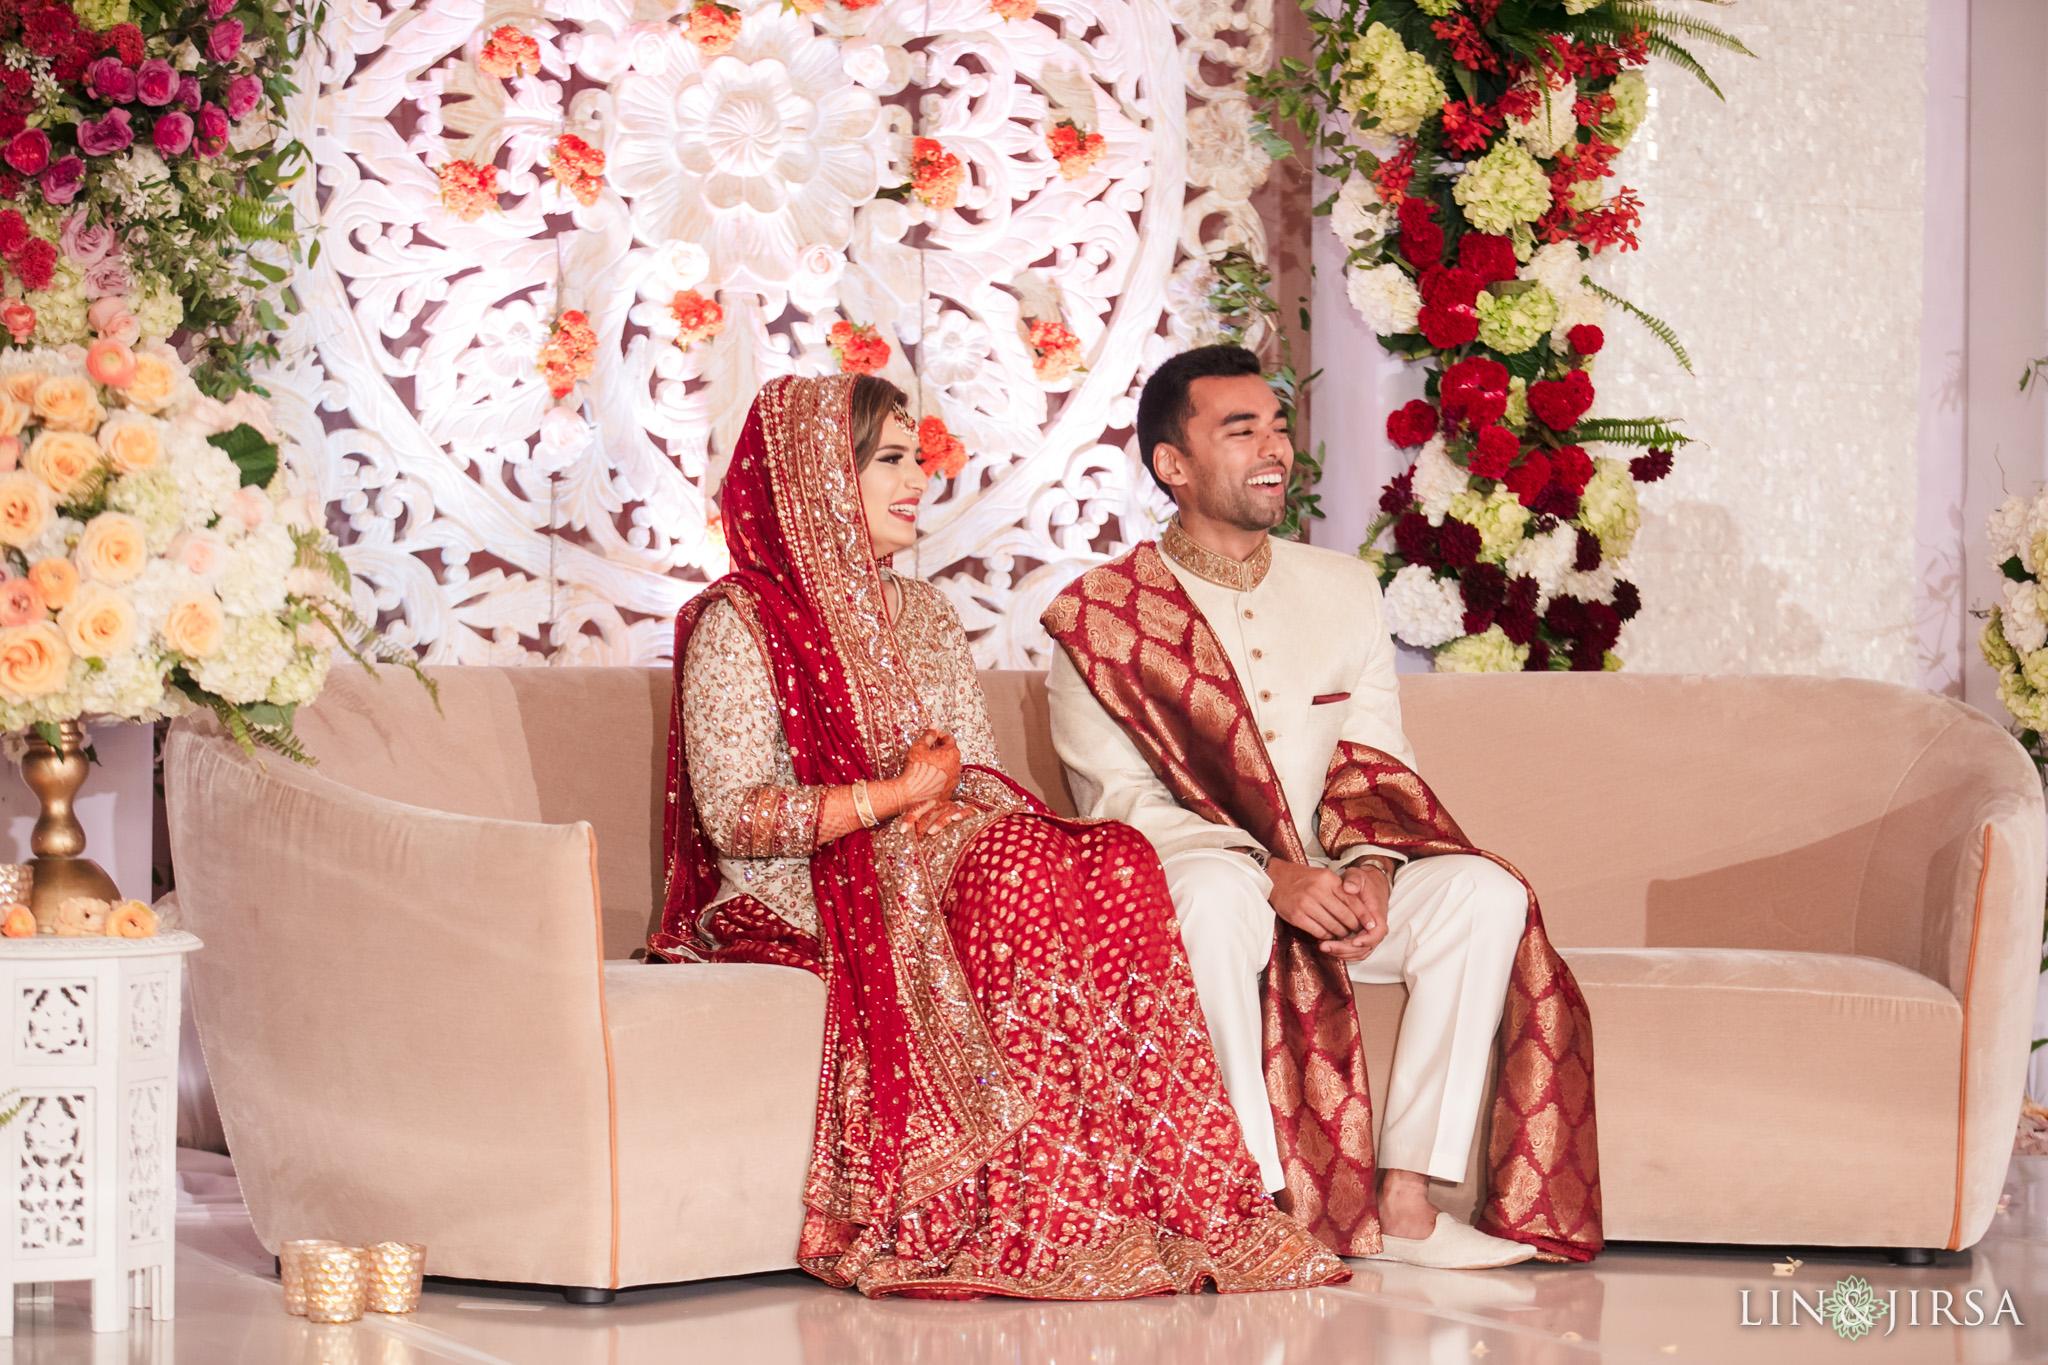 032 pasea hotel huntington beach pakistani muslim wedding photography